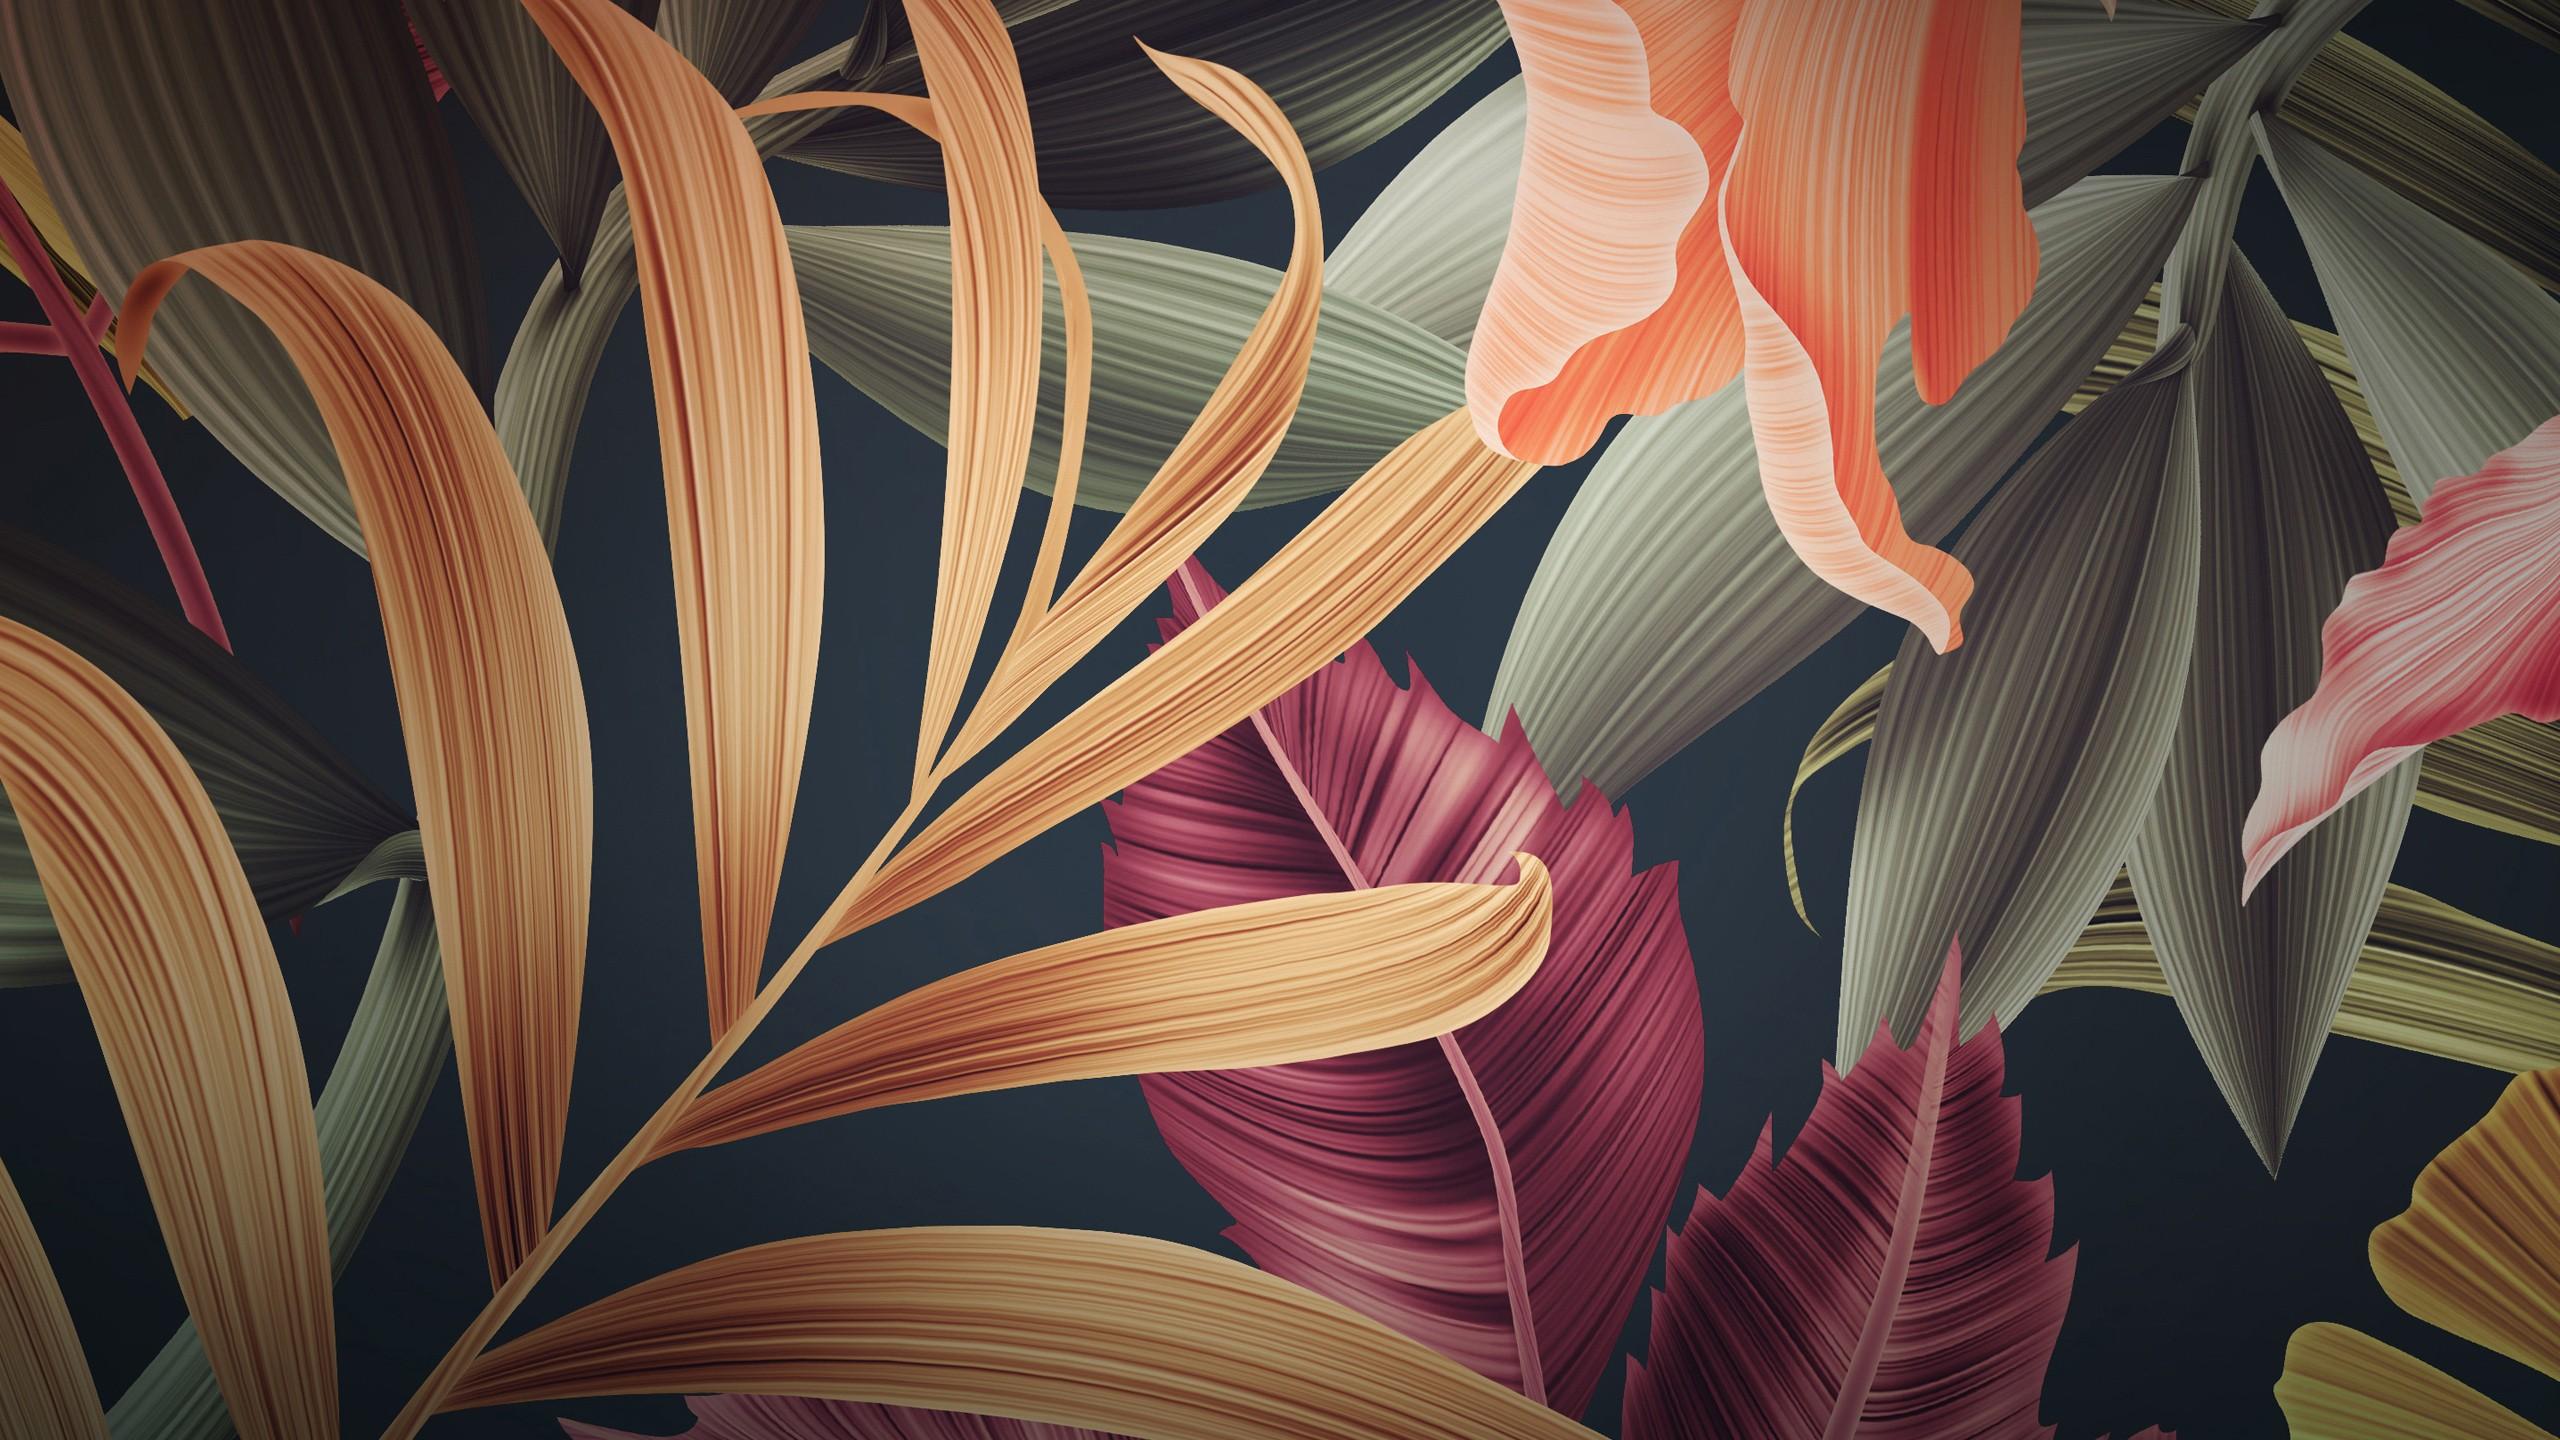 Hulk 3d Wallpaper Download Autumn Leaves Illustration Hd Wallpapers Hd Wallpapers